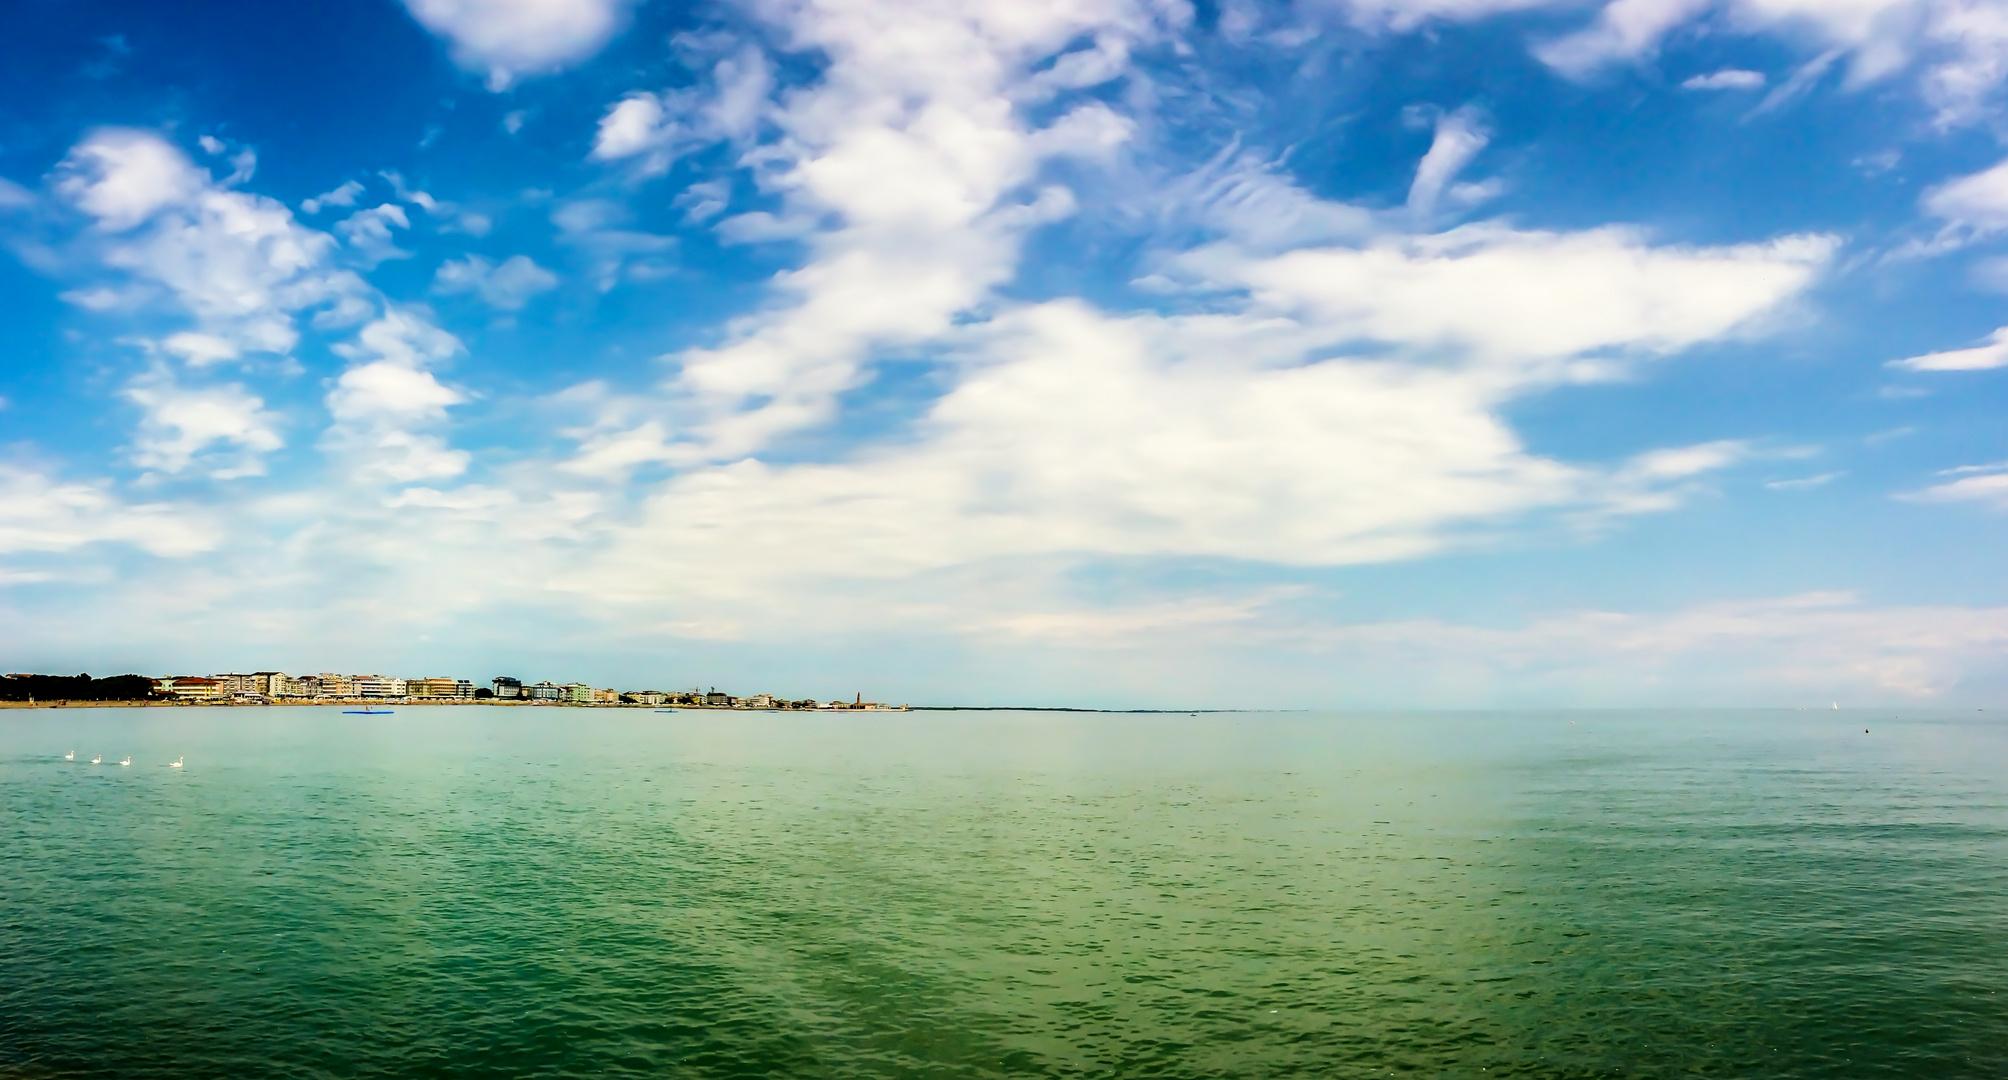 Panorama of Caorle #2